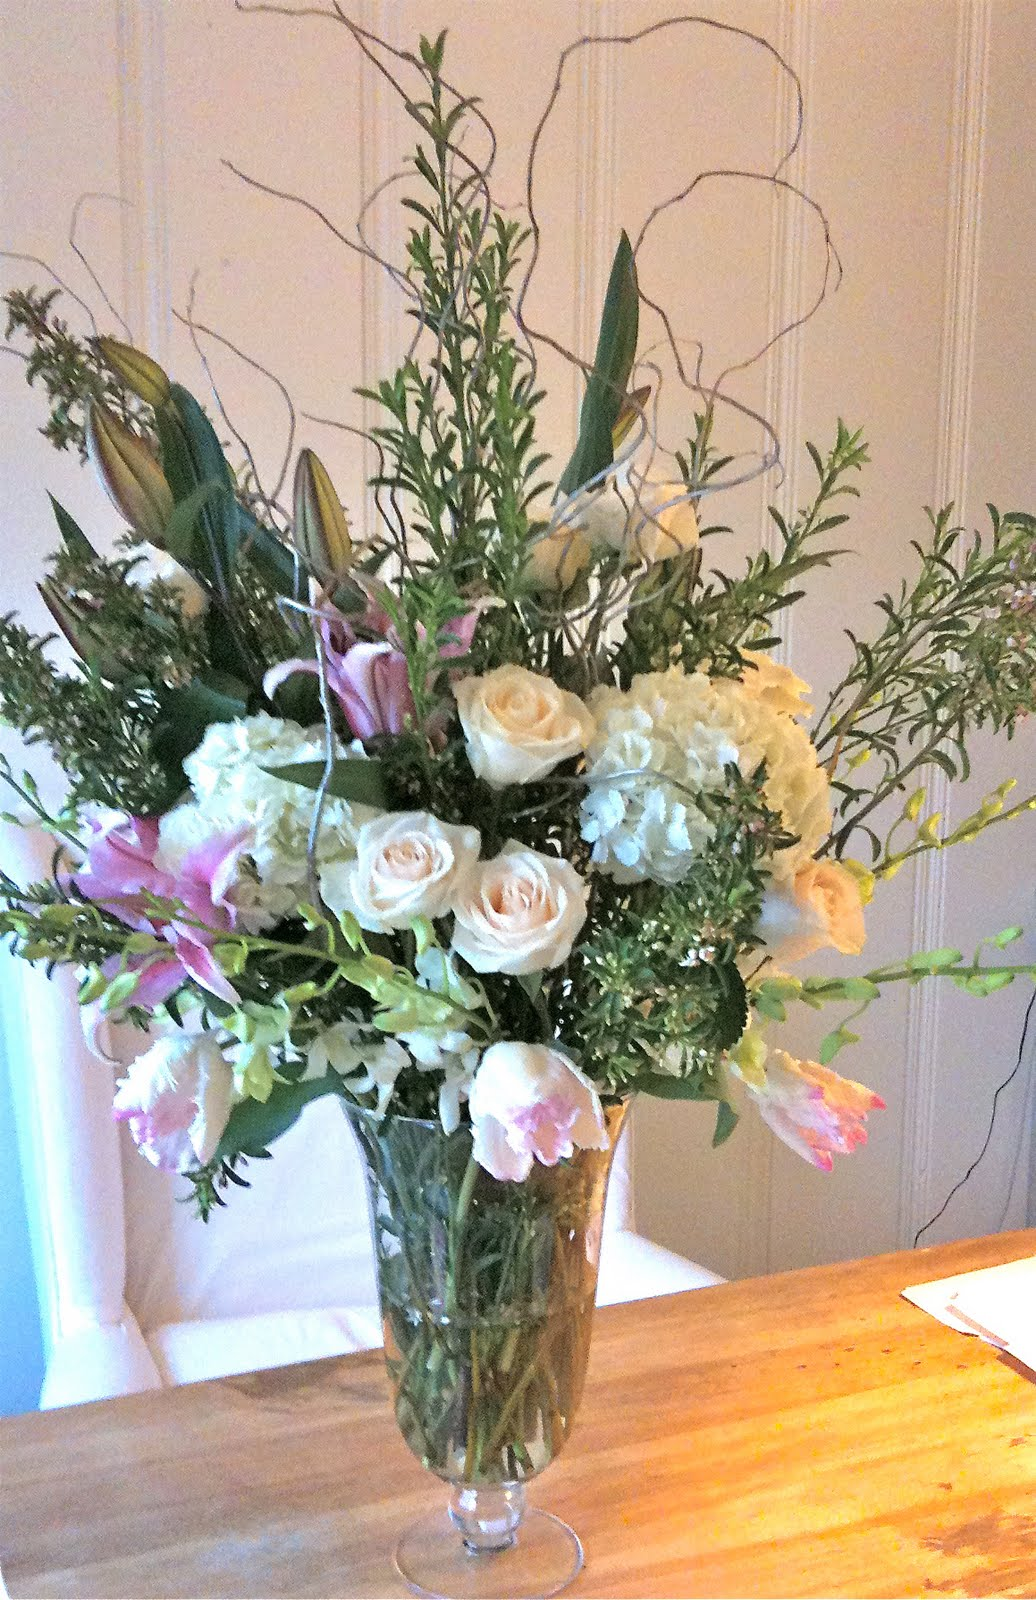 Jenny steffens hobick diy large flower arrangement